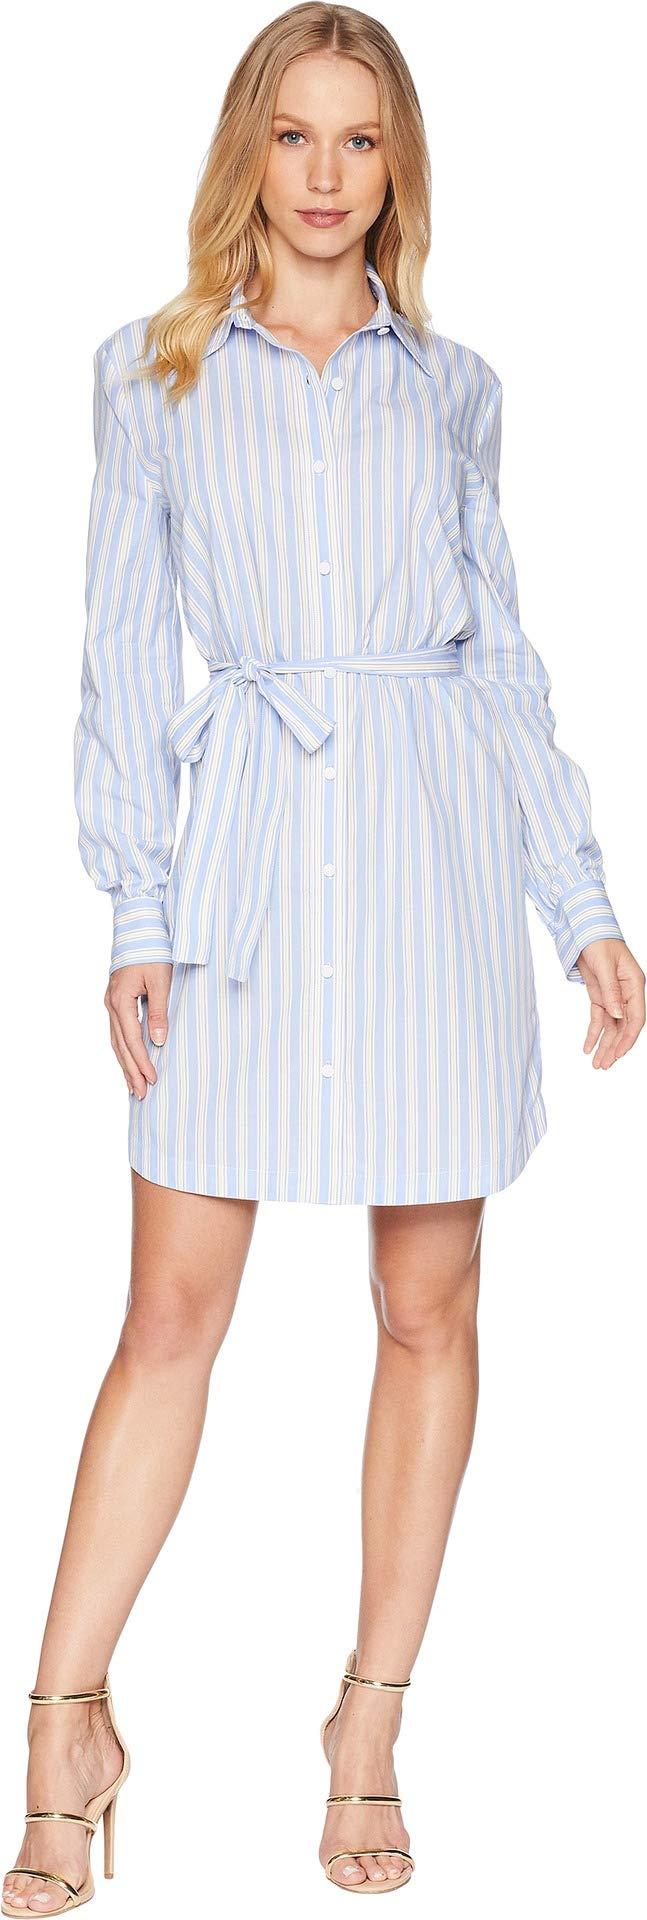 Juicy Couture Women's Stripe Cotton Shirtdress Sushine Pinstripe X-Large